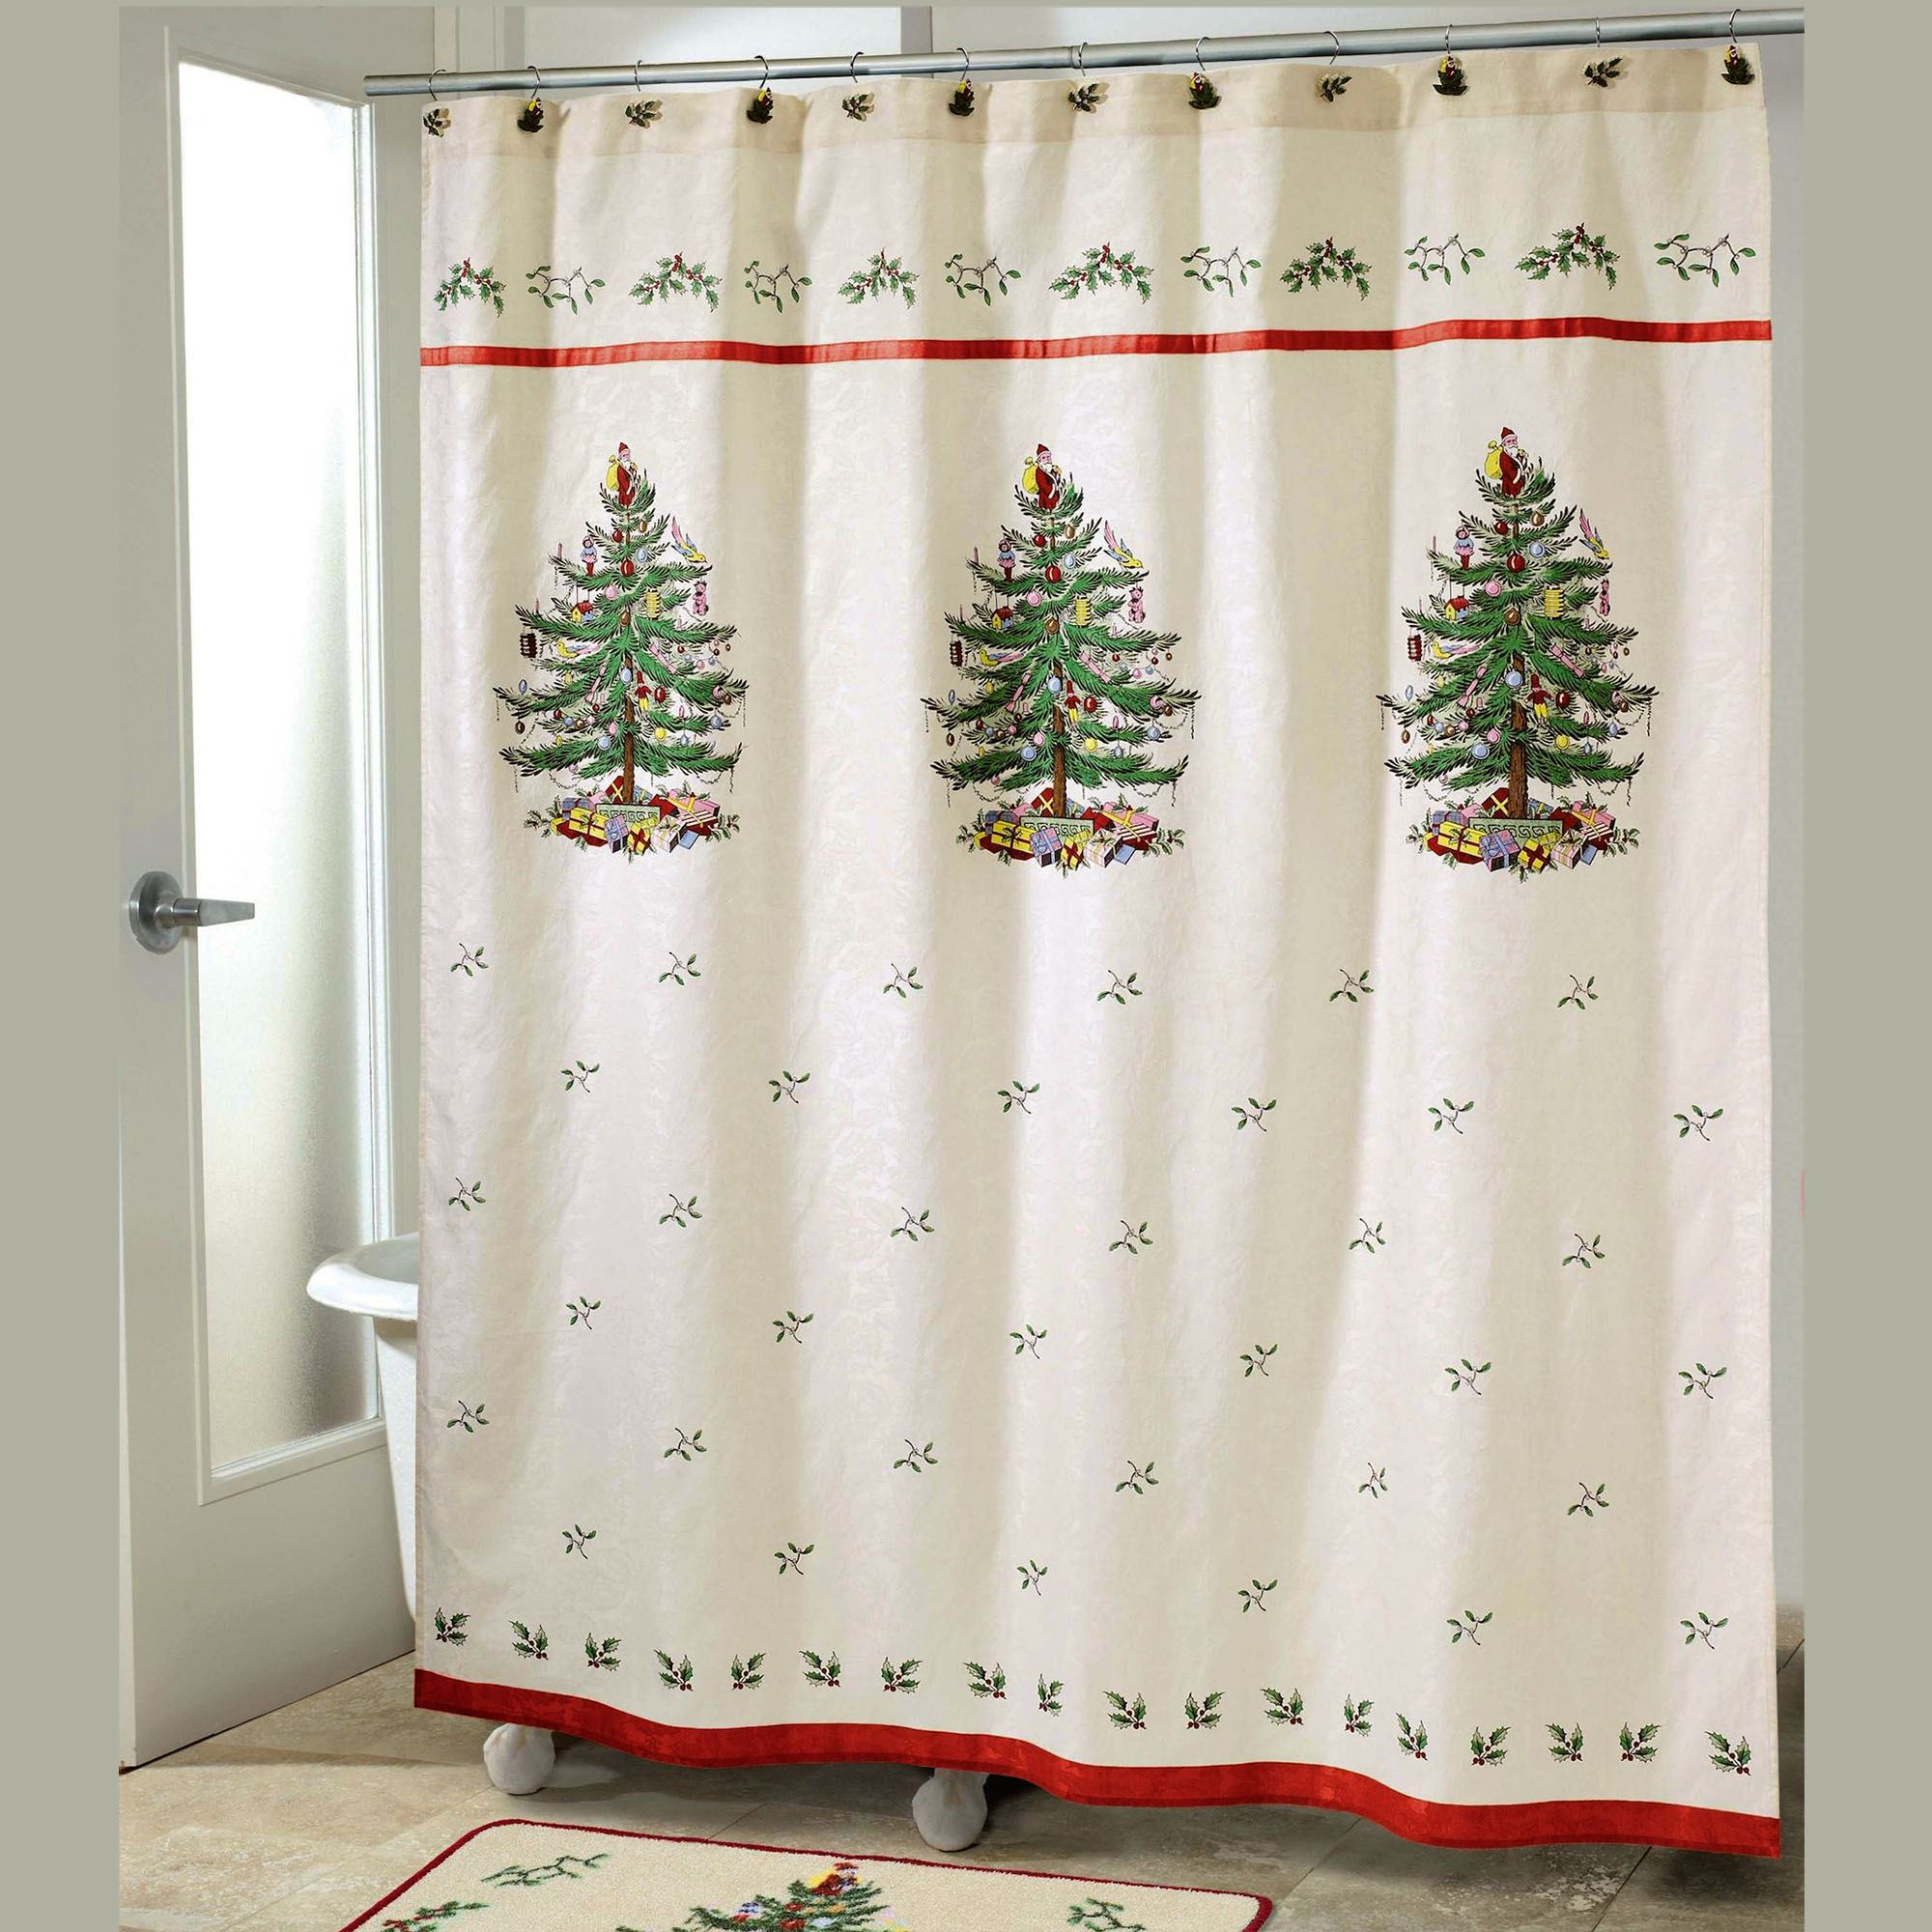 Christmas Shower Curtain.Spode Christmas Tree Shower Curtain